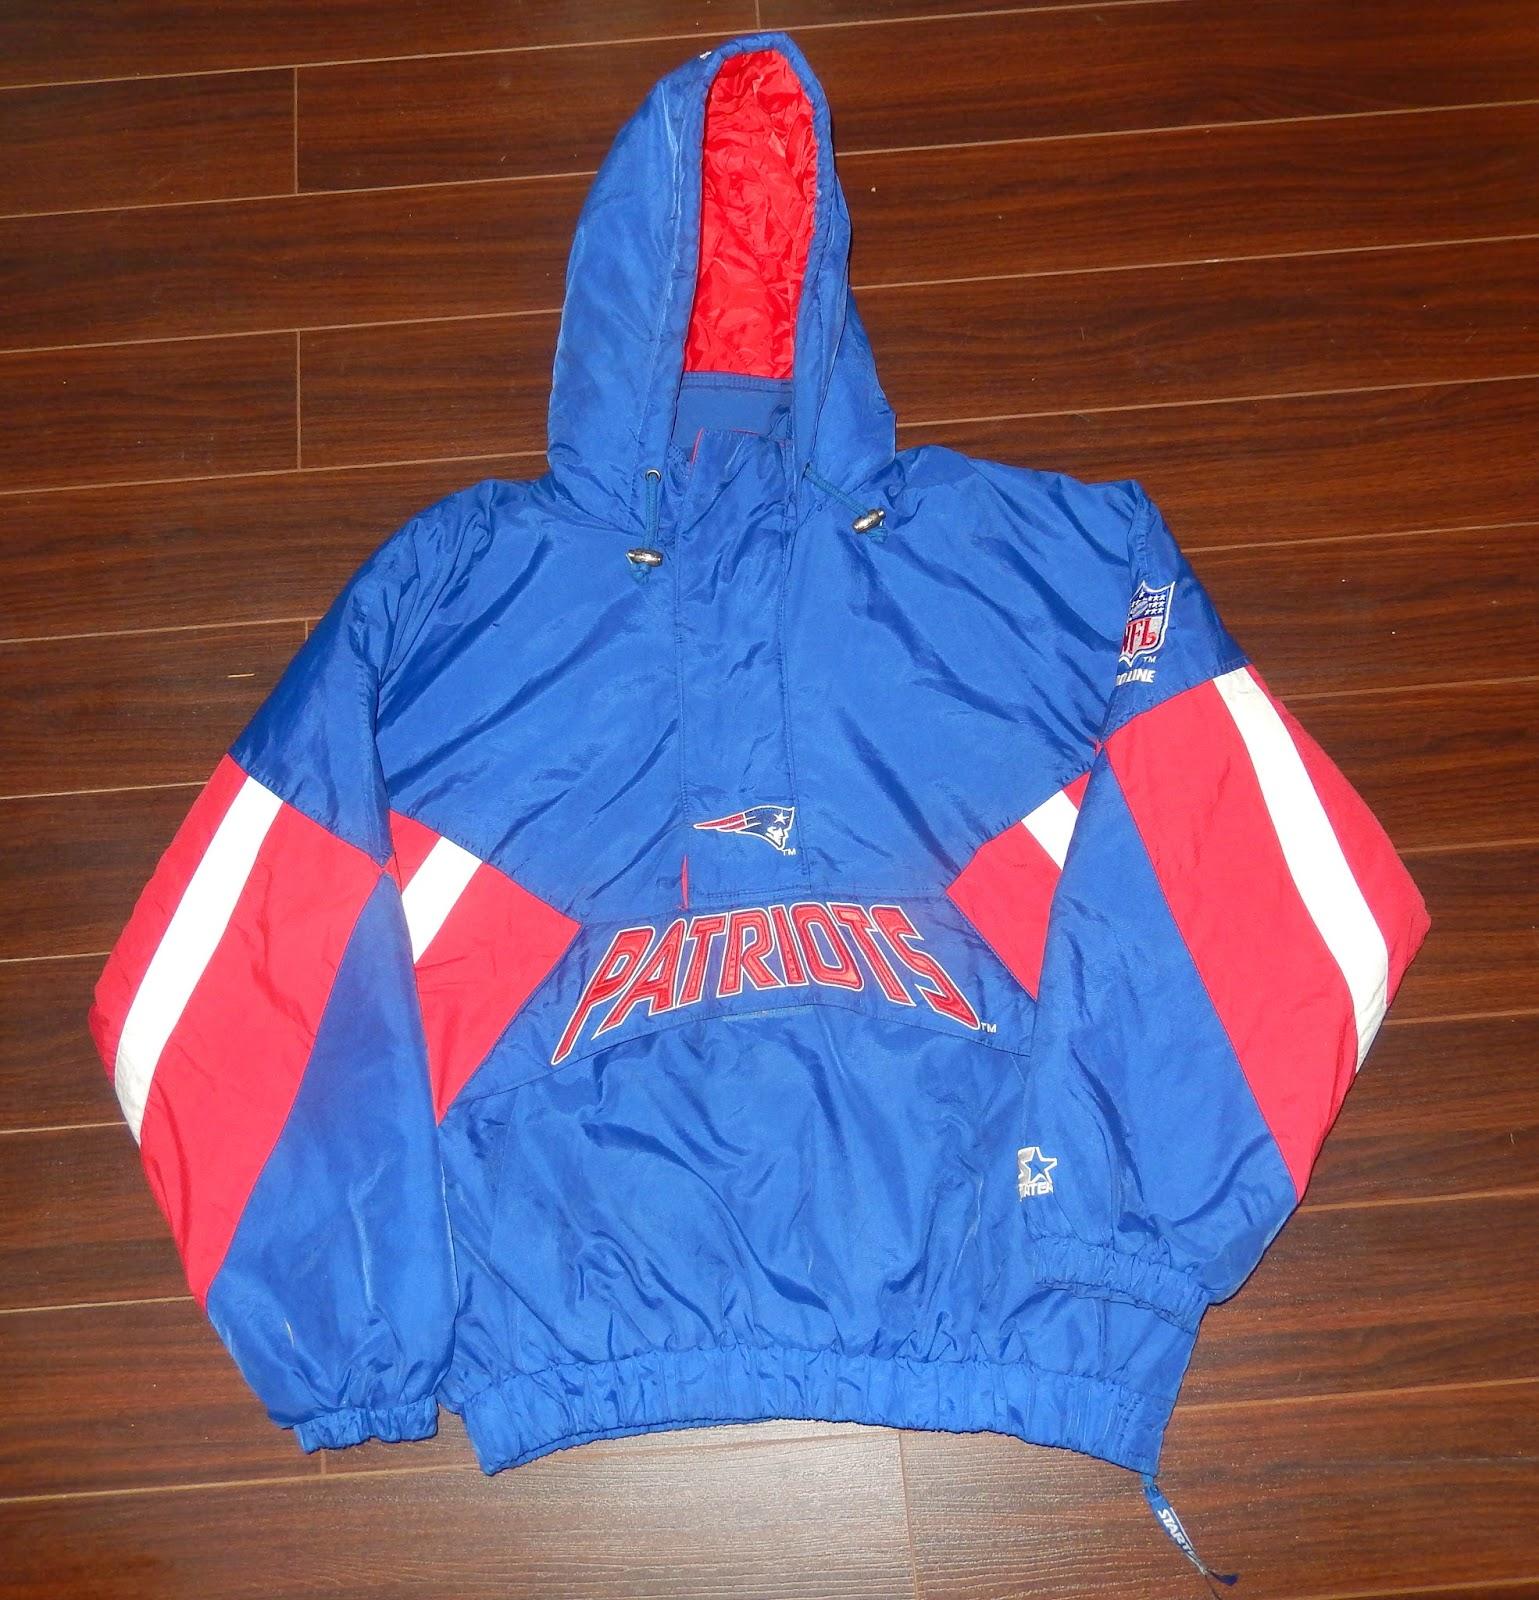 ceb68b25 Vintage Sports Apparel: VIntage New England Patriots Starter ...